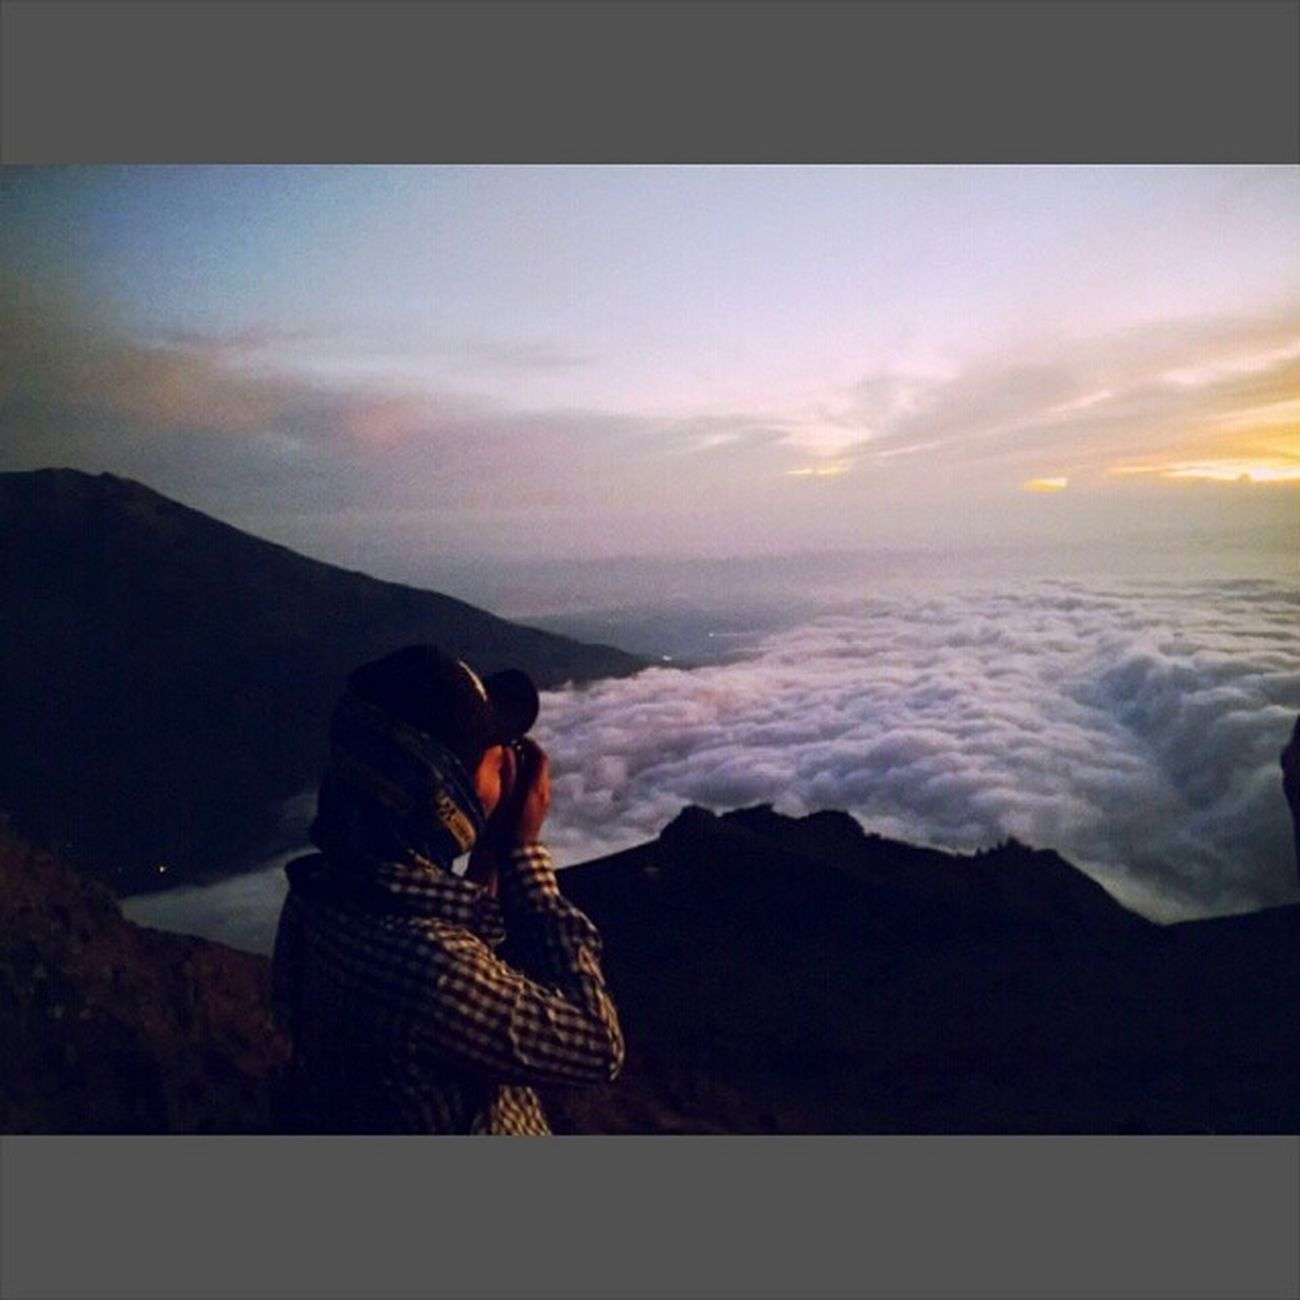 jepret jepret Kameraslrgue Latepostbgt Lautanawan Sunrise instagallery instanature instanusantara